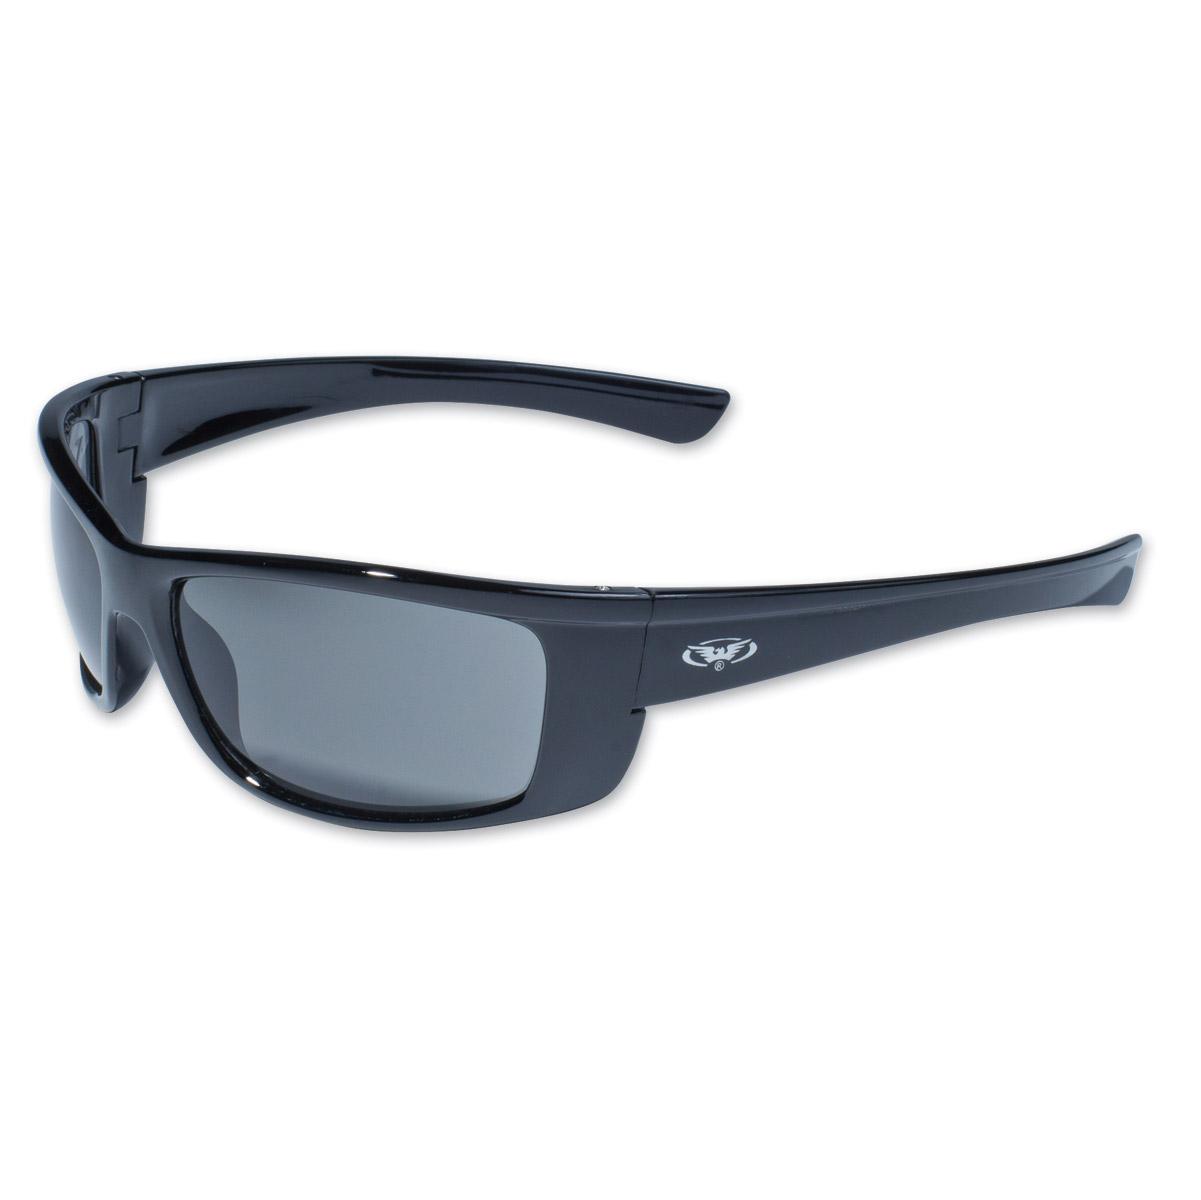 global vision eyewear eye black frame sunglasses